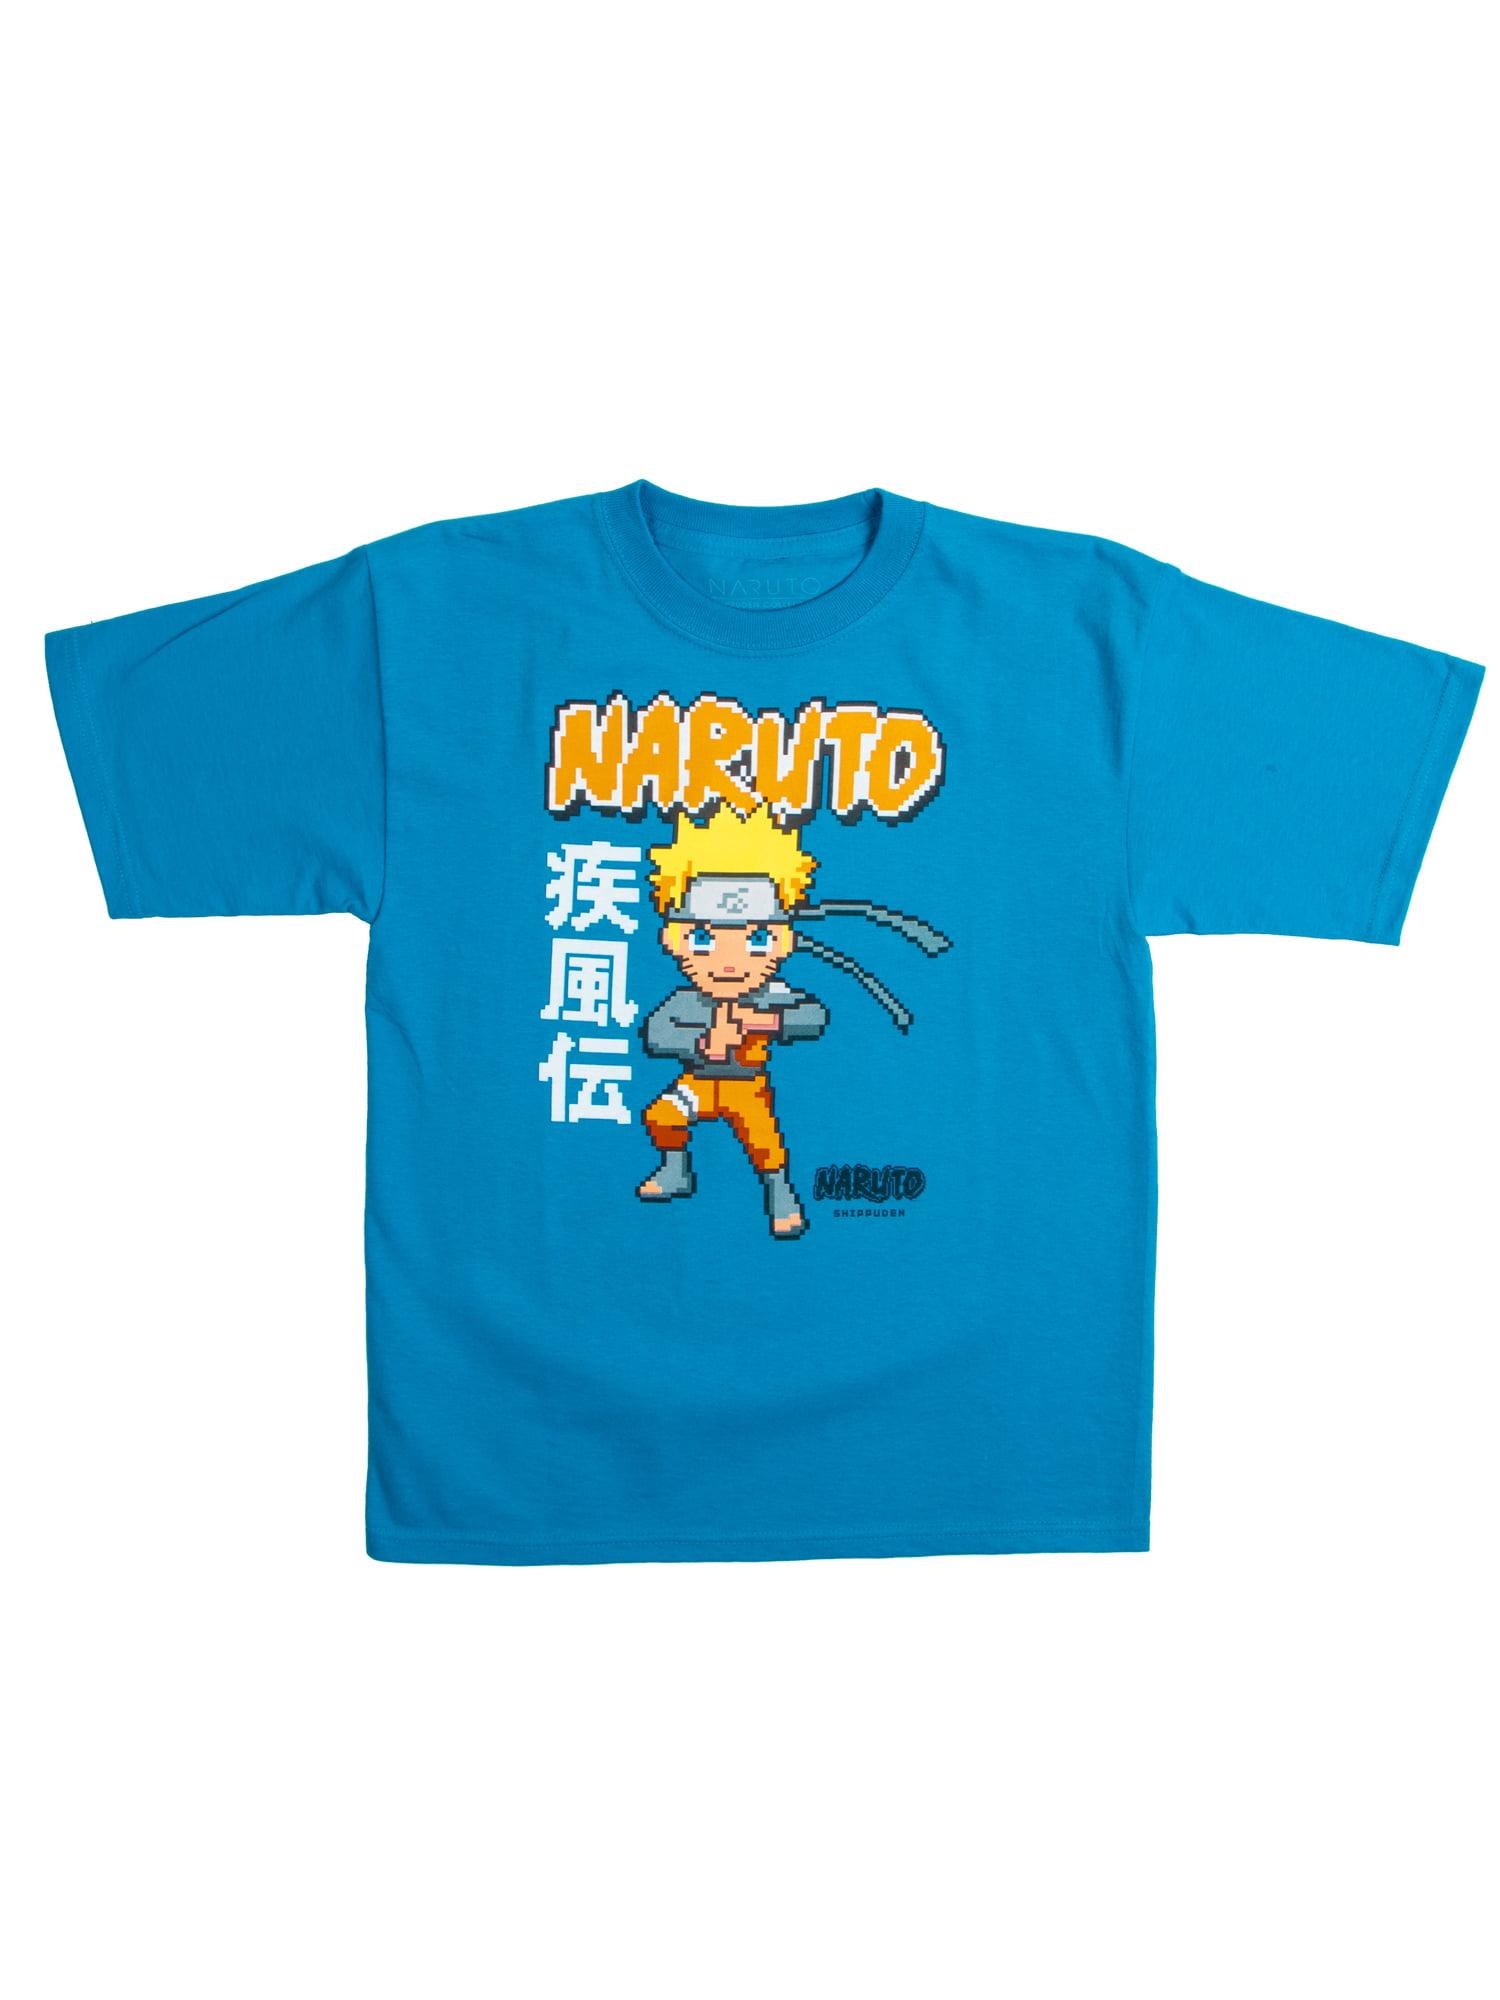 Naruto Naruto Graphic Short Sleeve Tee Little Boys Big Boys